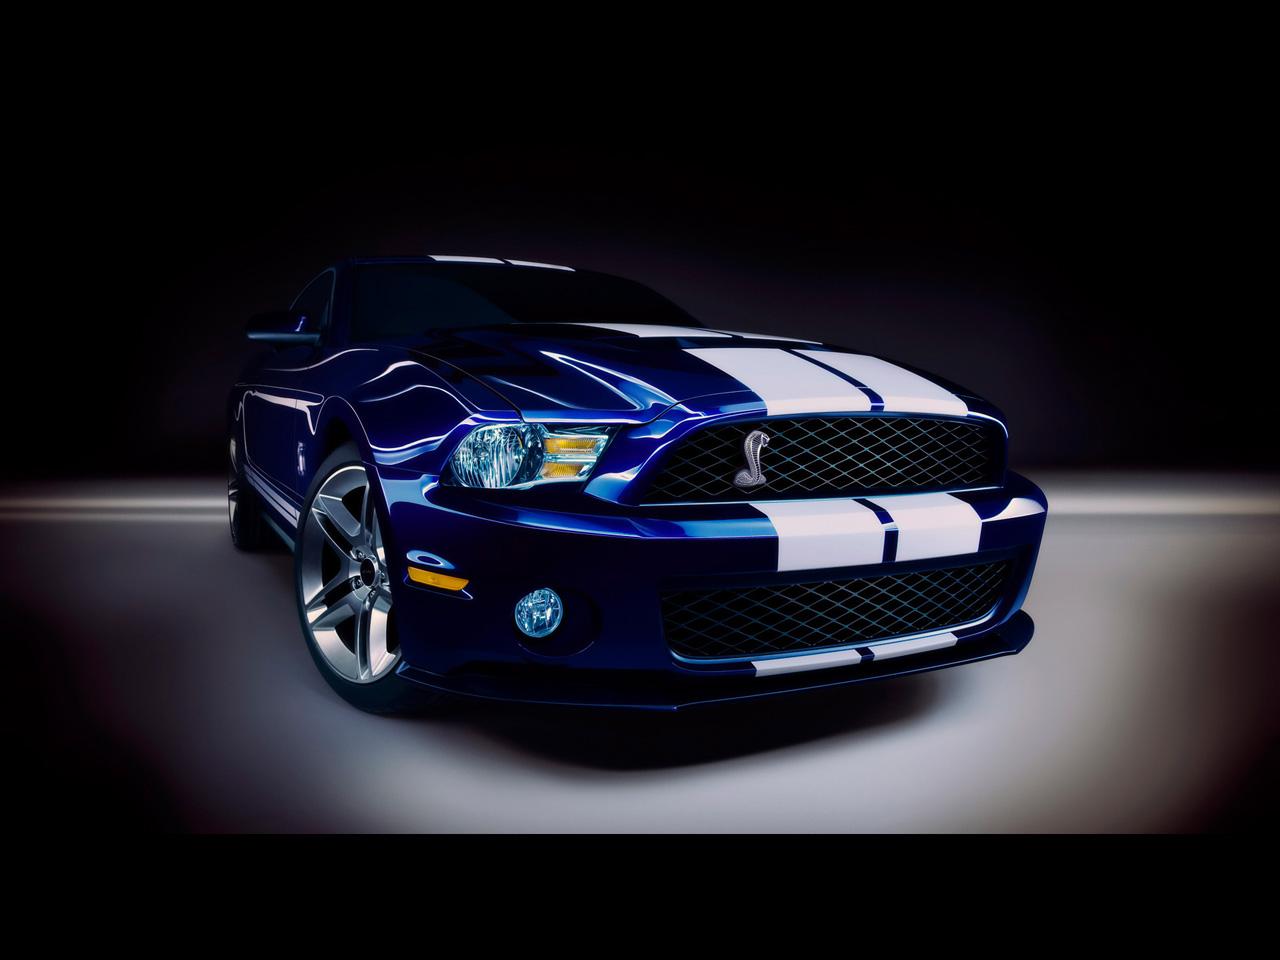 Mustang Shelby GT 500 Desktop Wallpapers FREE on Latorocom 1280x960